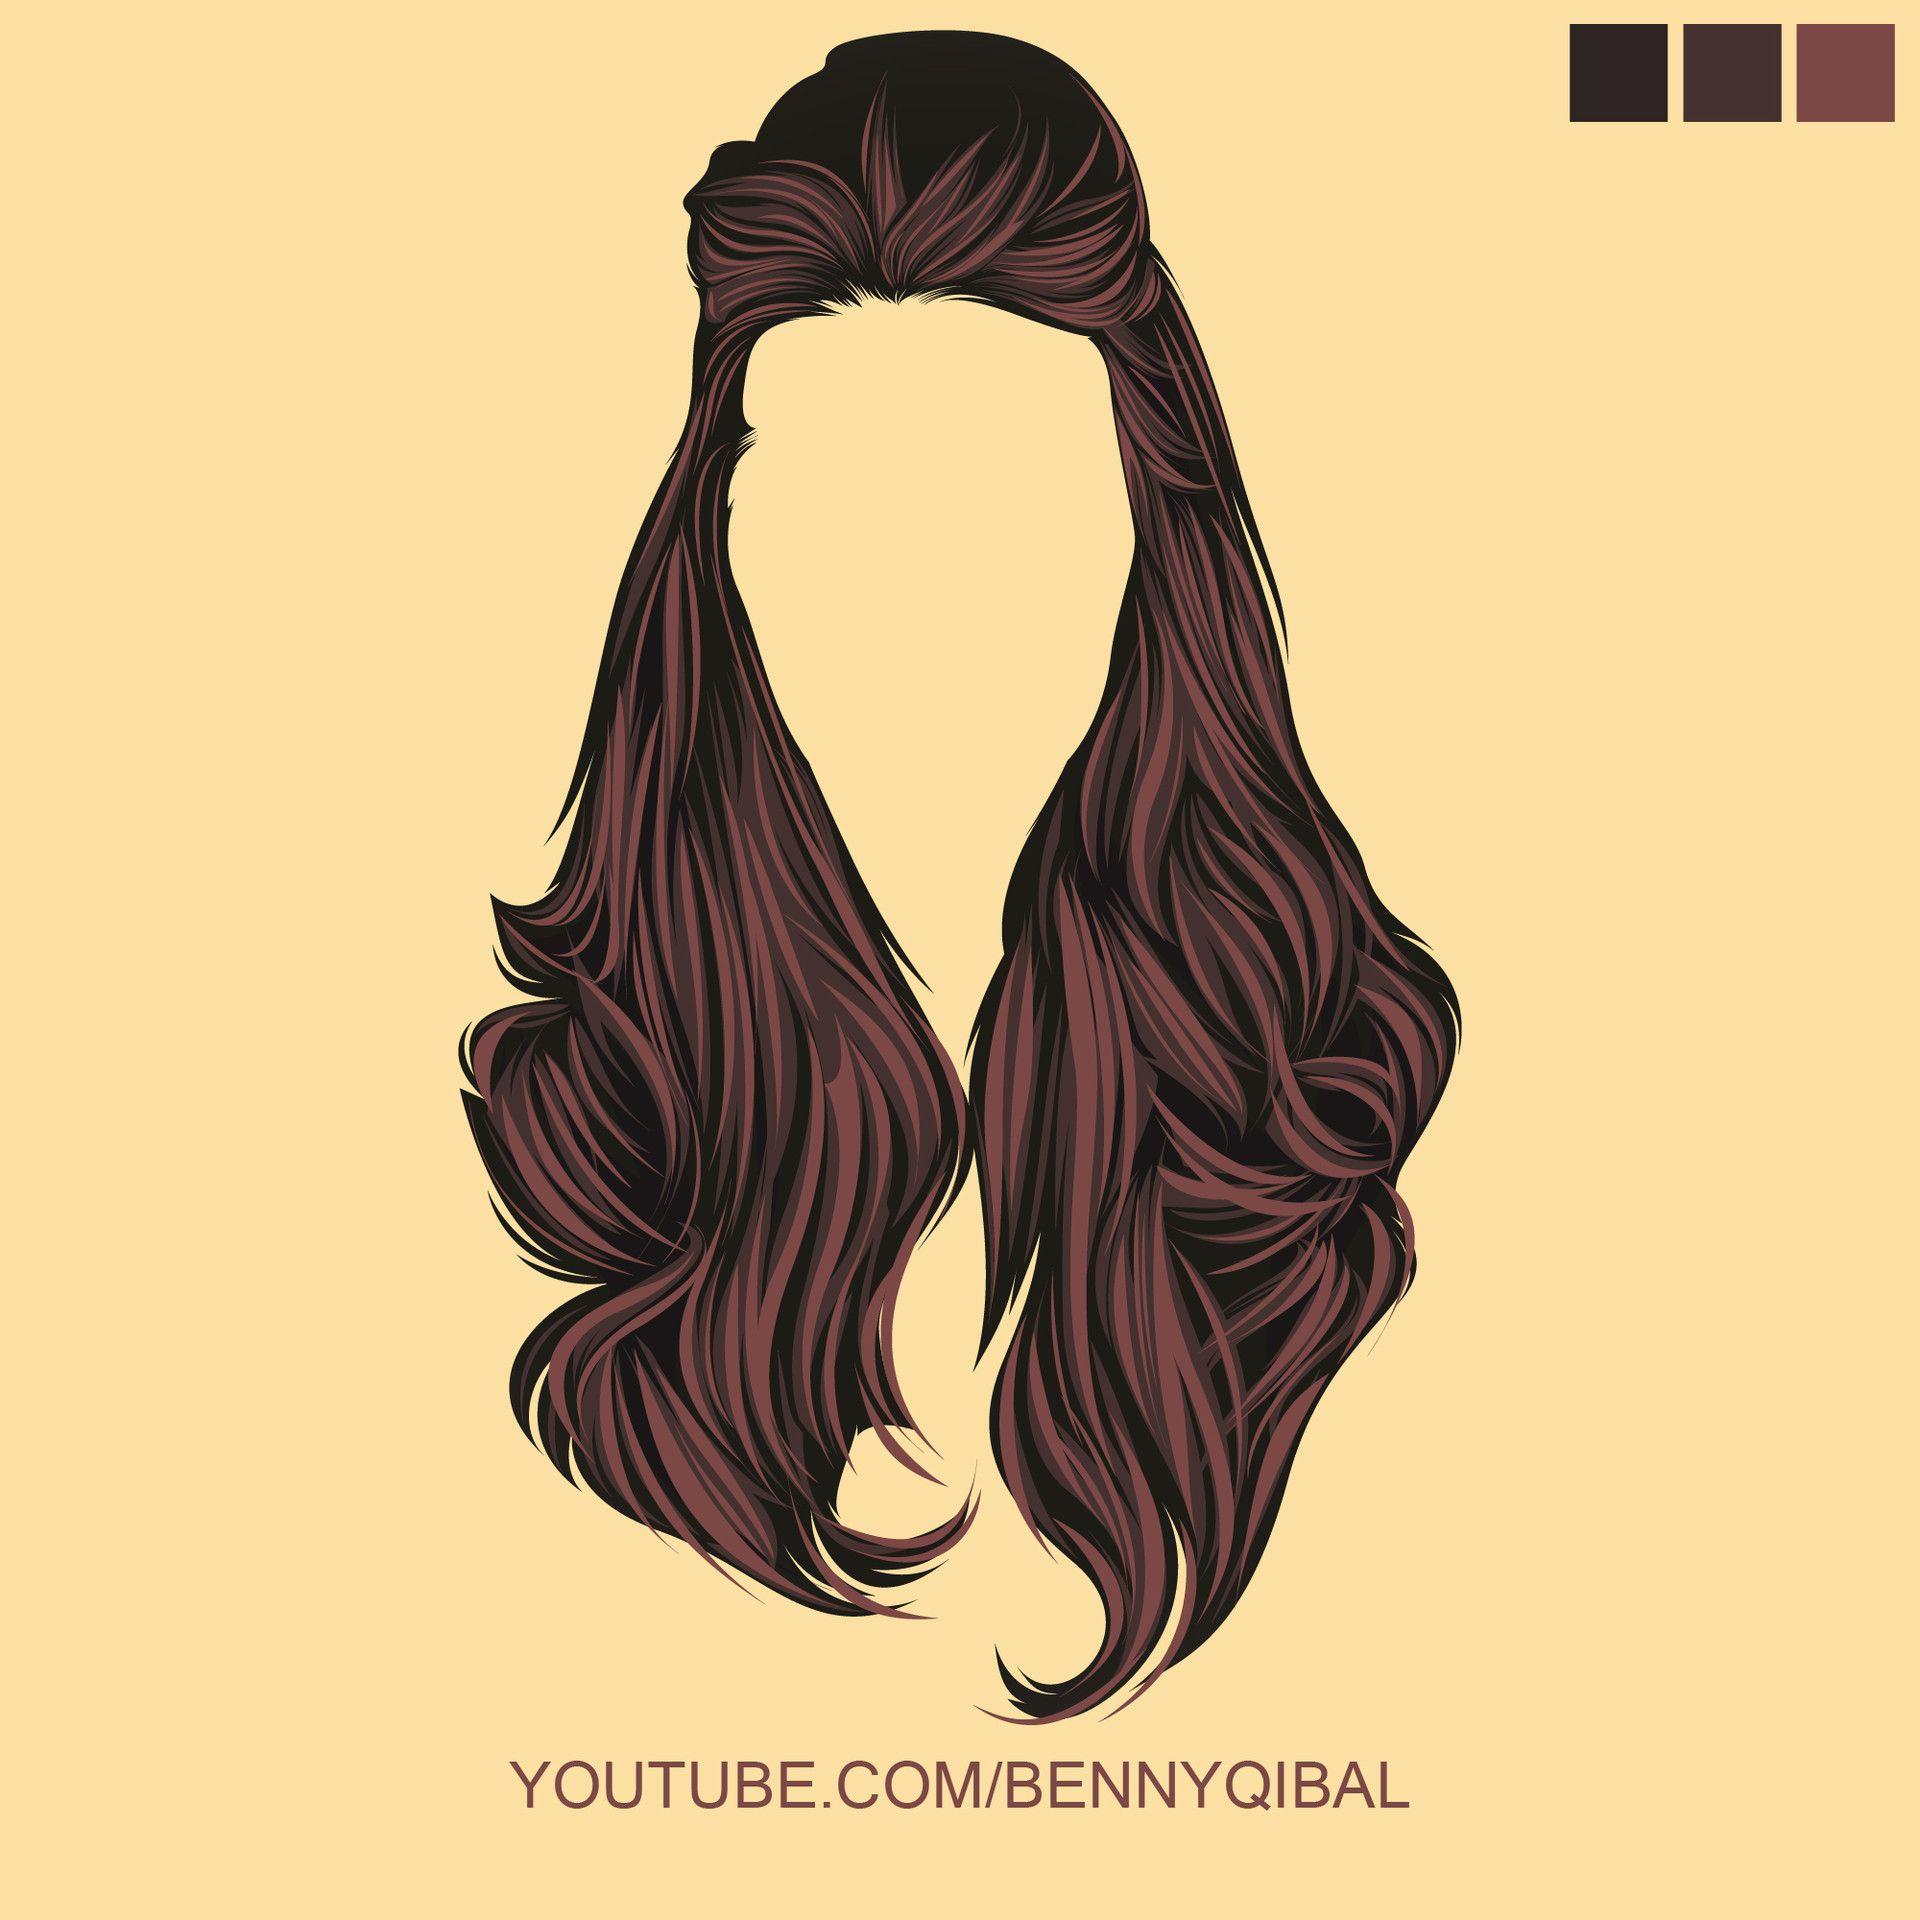 Video Tutorial How To Make Vector Hair Using Adobe Illustrator Learn